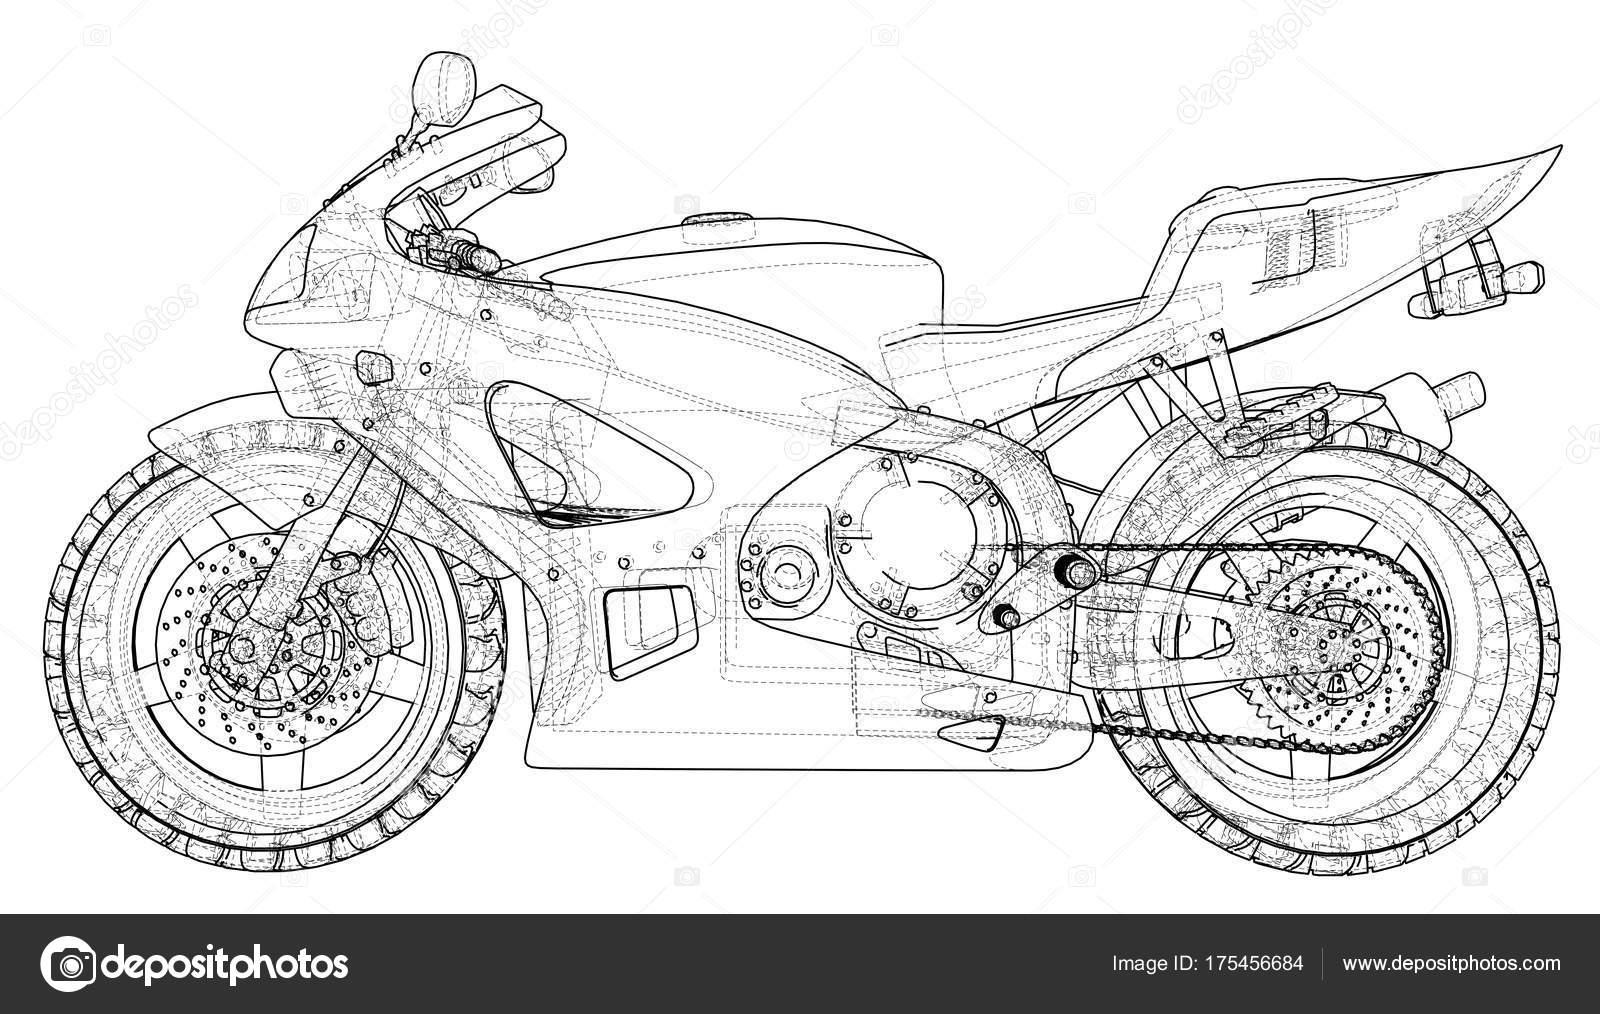 Moto deportiva de blueprint eps10 formato vector de 3d archivo moto deportiva de blueprint eps10 formato vector de 3d archivo imgenes vectoriales malvernweather Choice Image